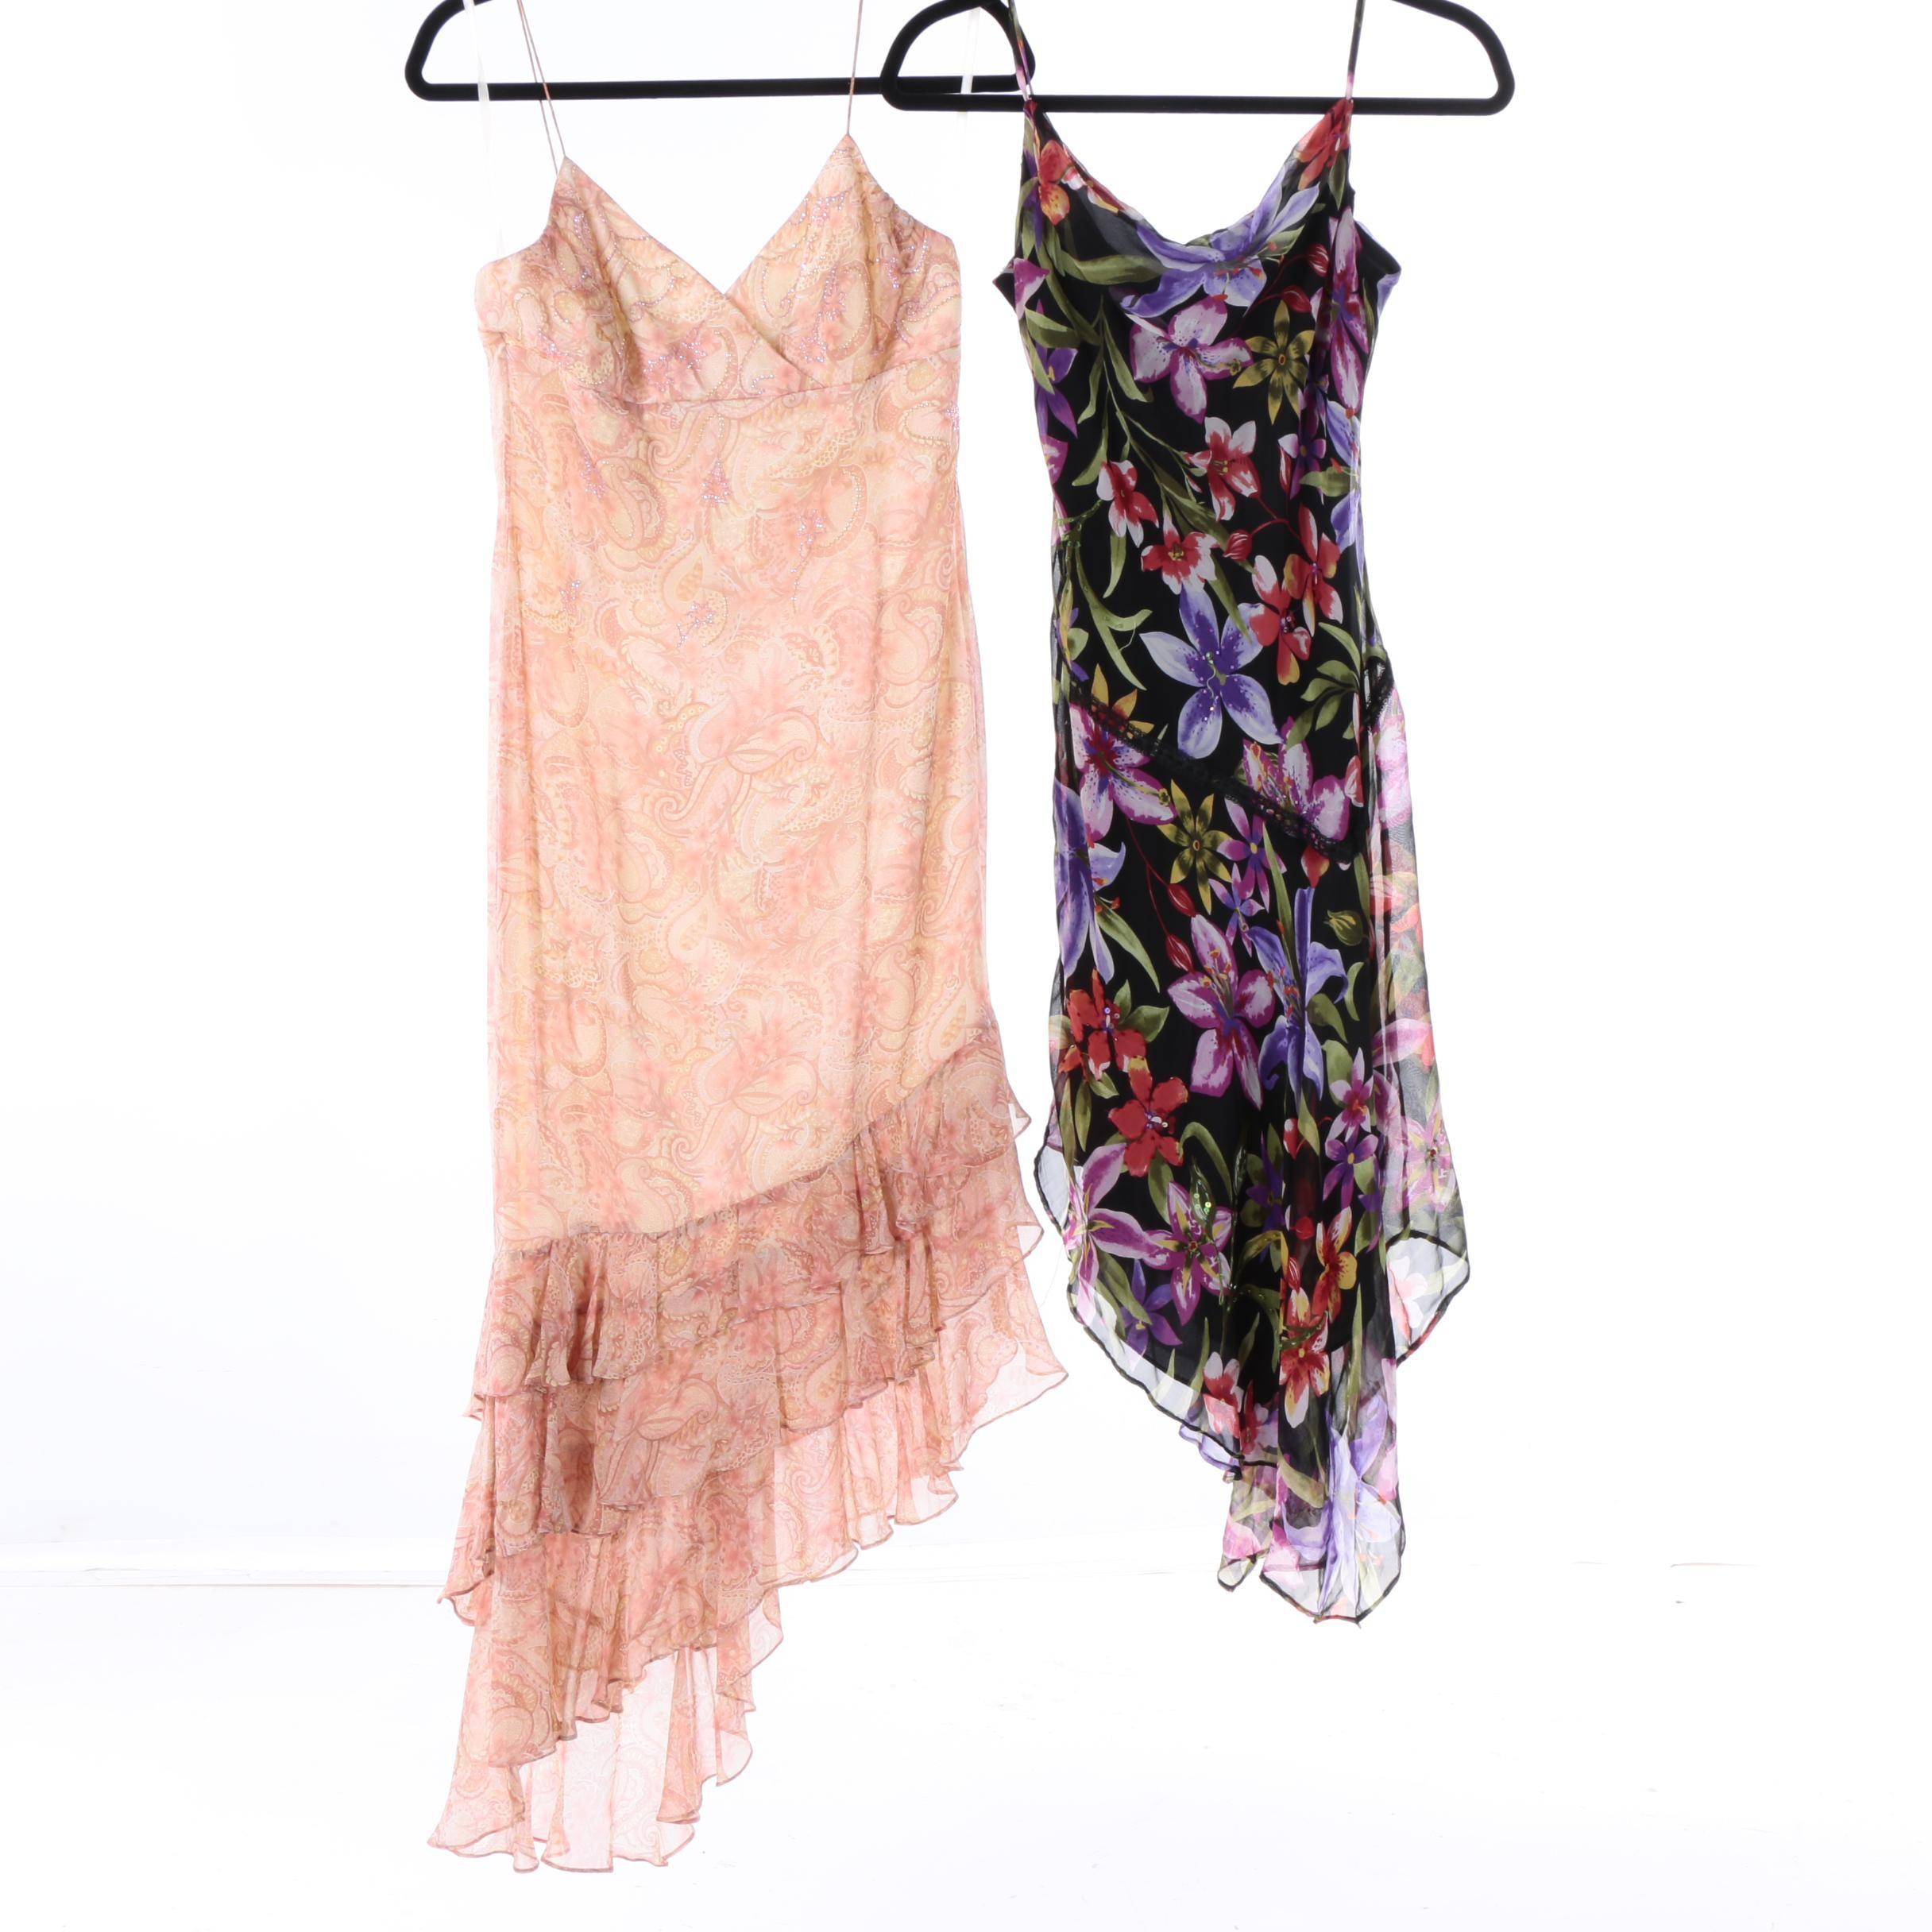 Women's Rimini and Robbie Bee Printed Silk Dresses